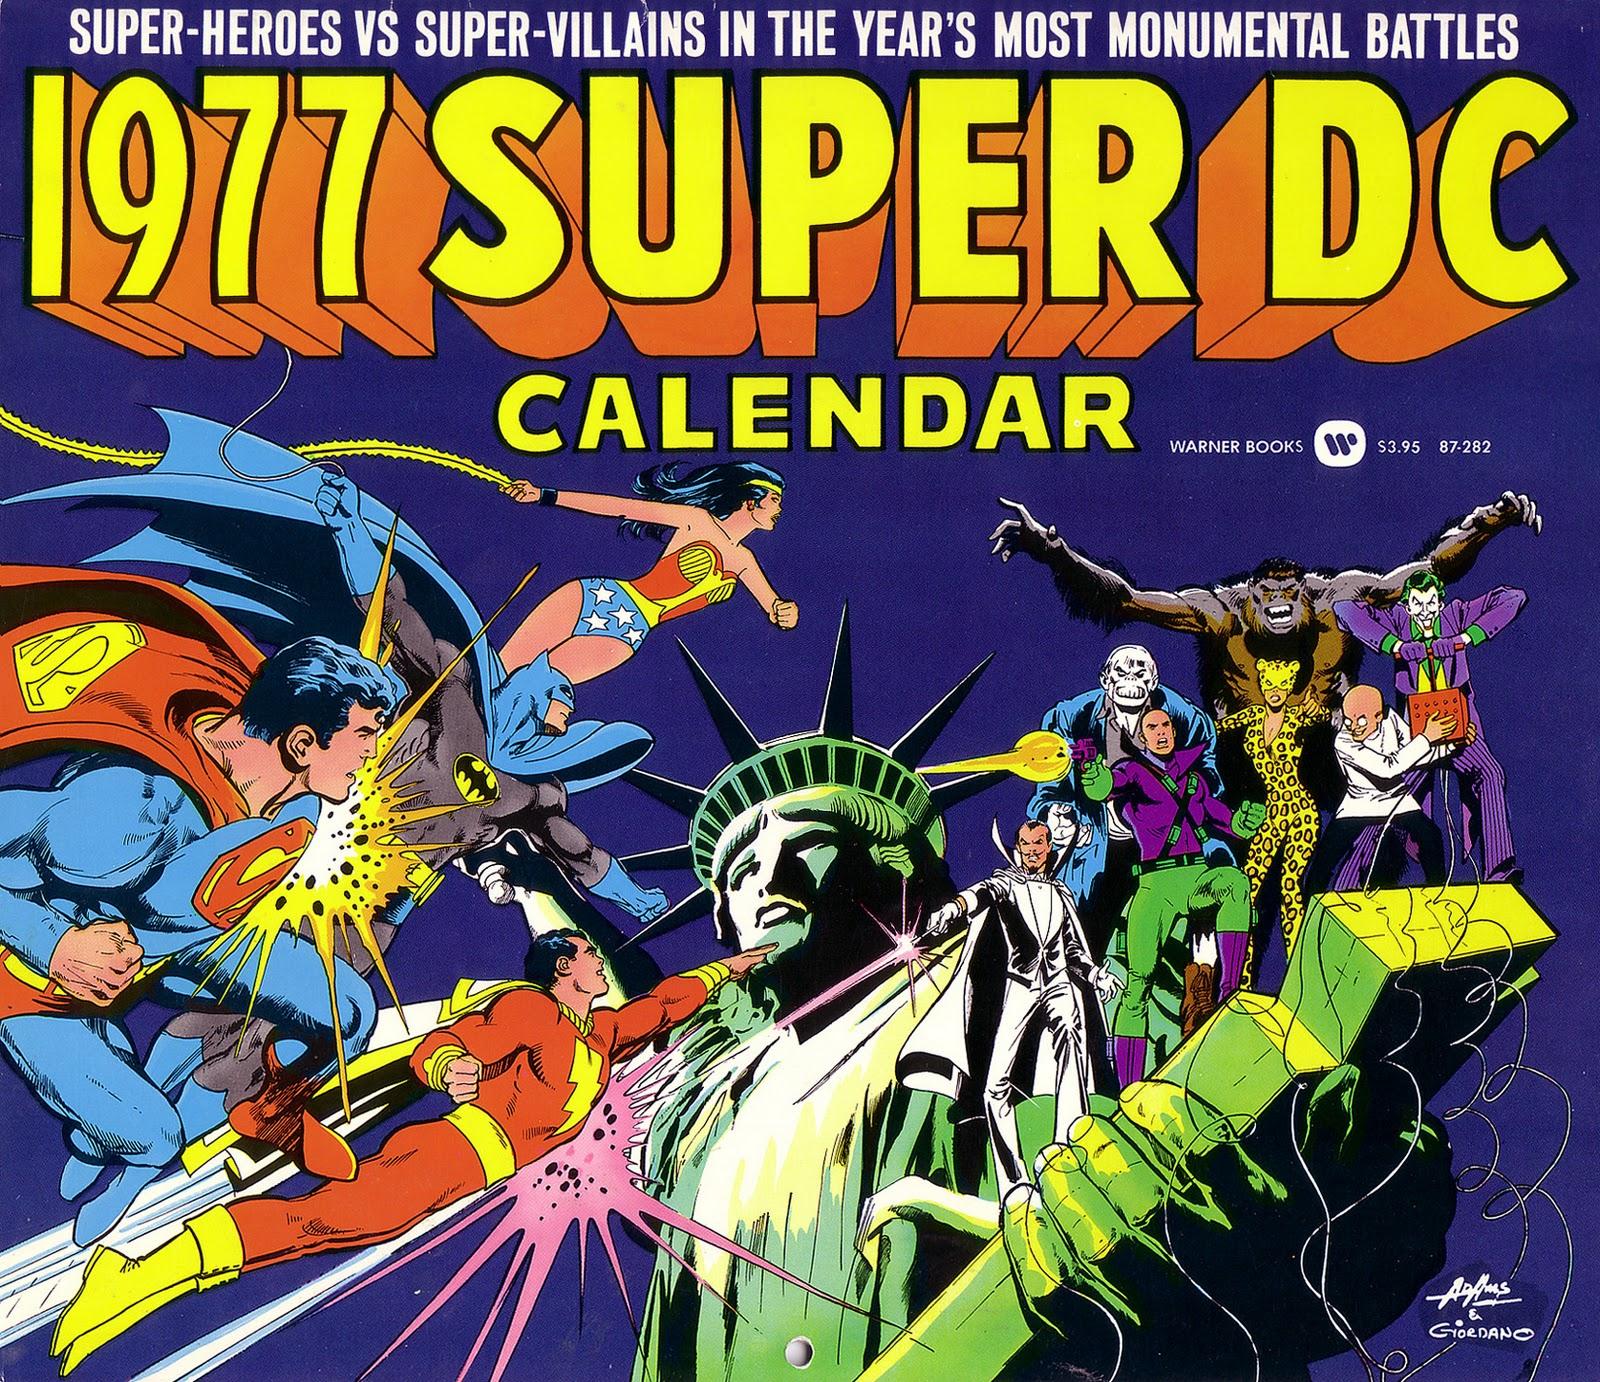 1977_Super_DC_Calendar_-__Front_Cover